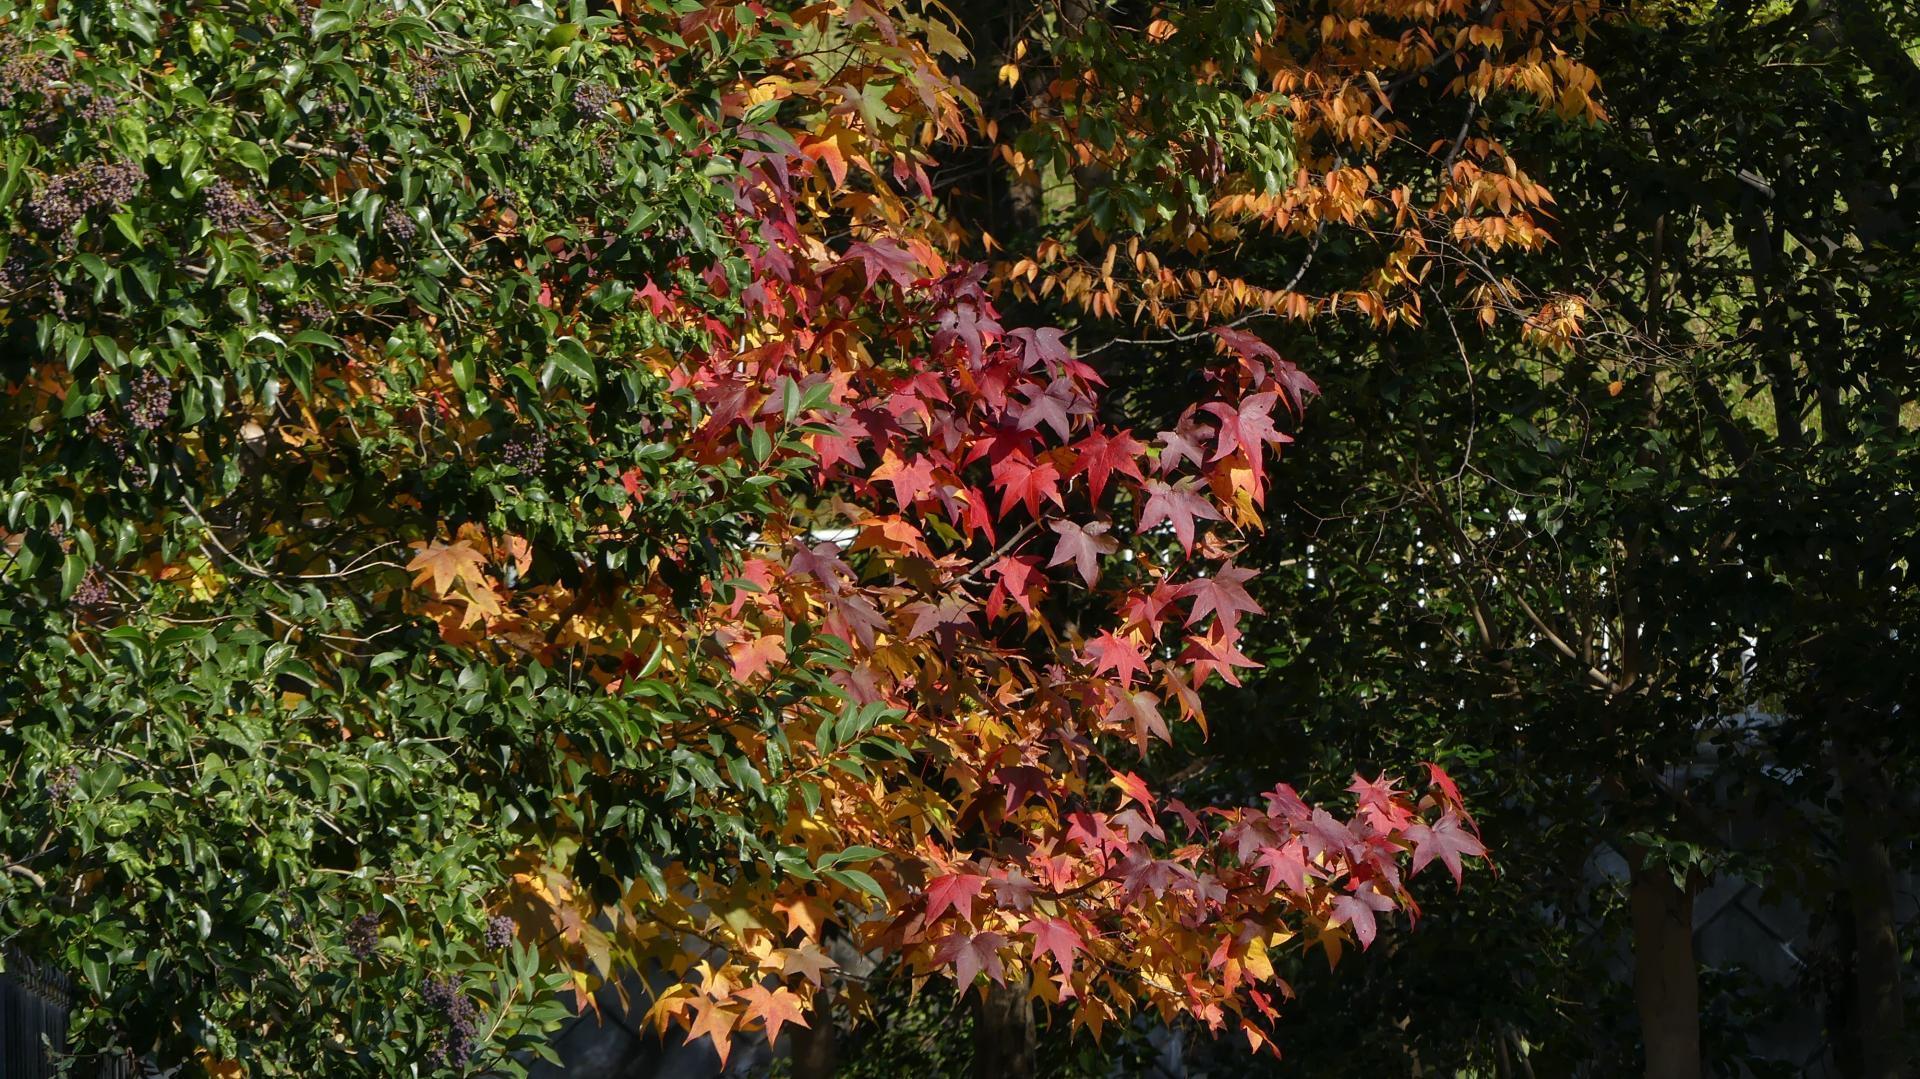 秋色の散歩道_a0185081_23081787.jpg